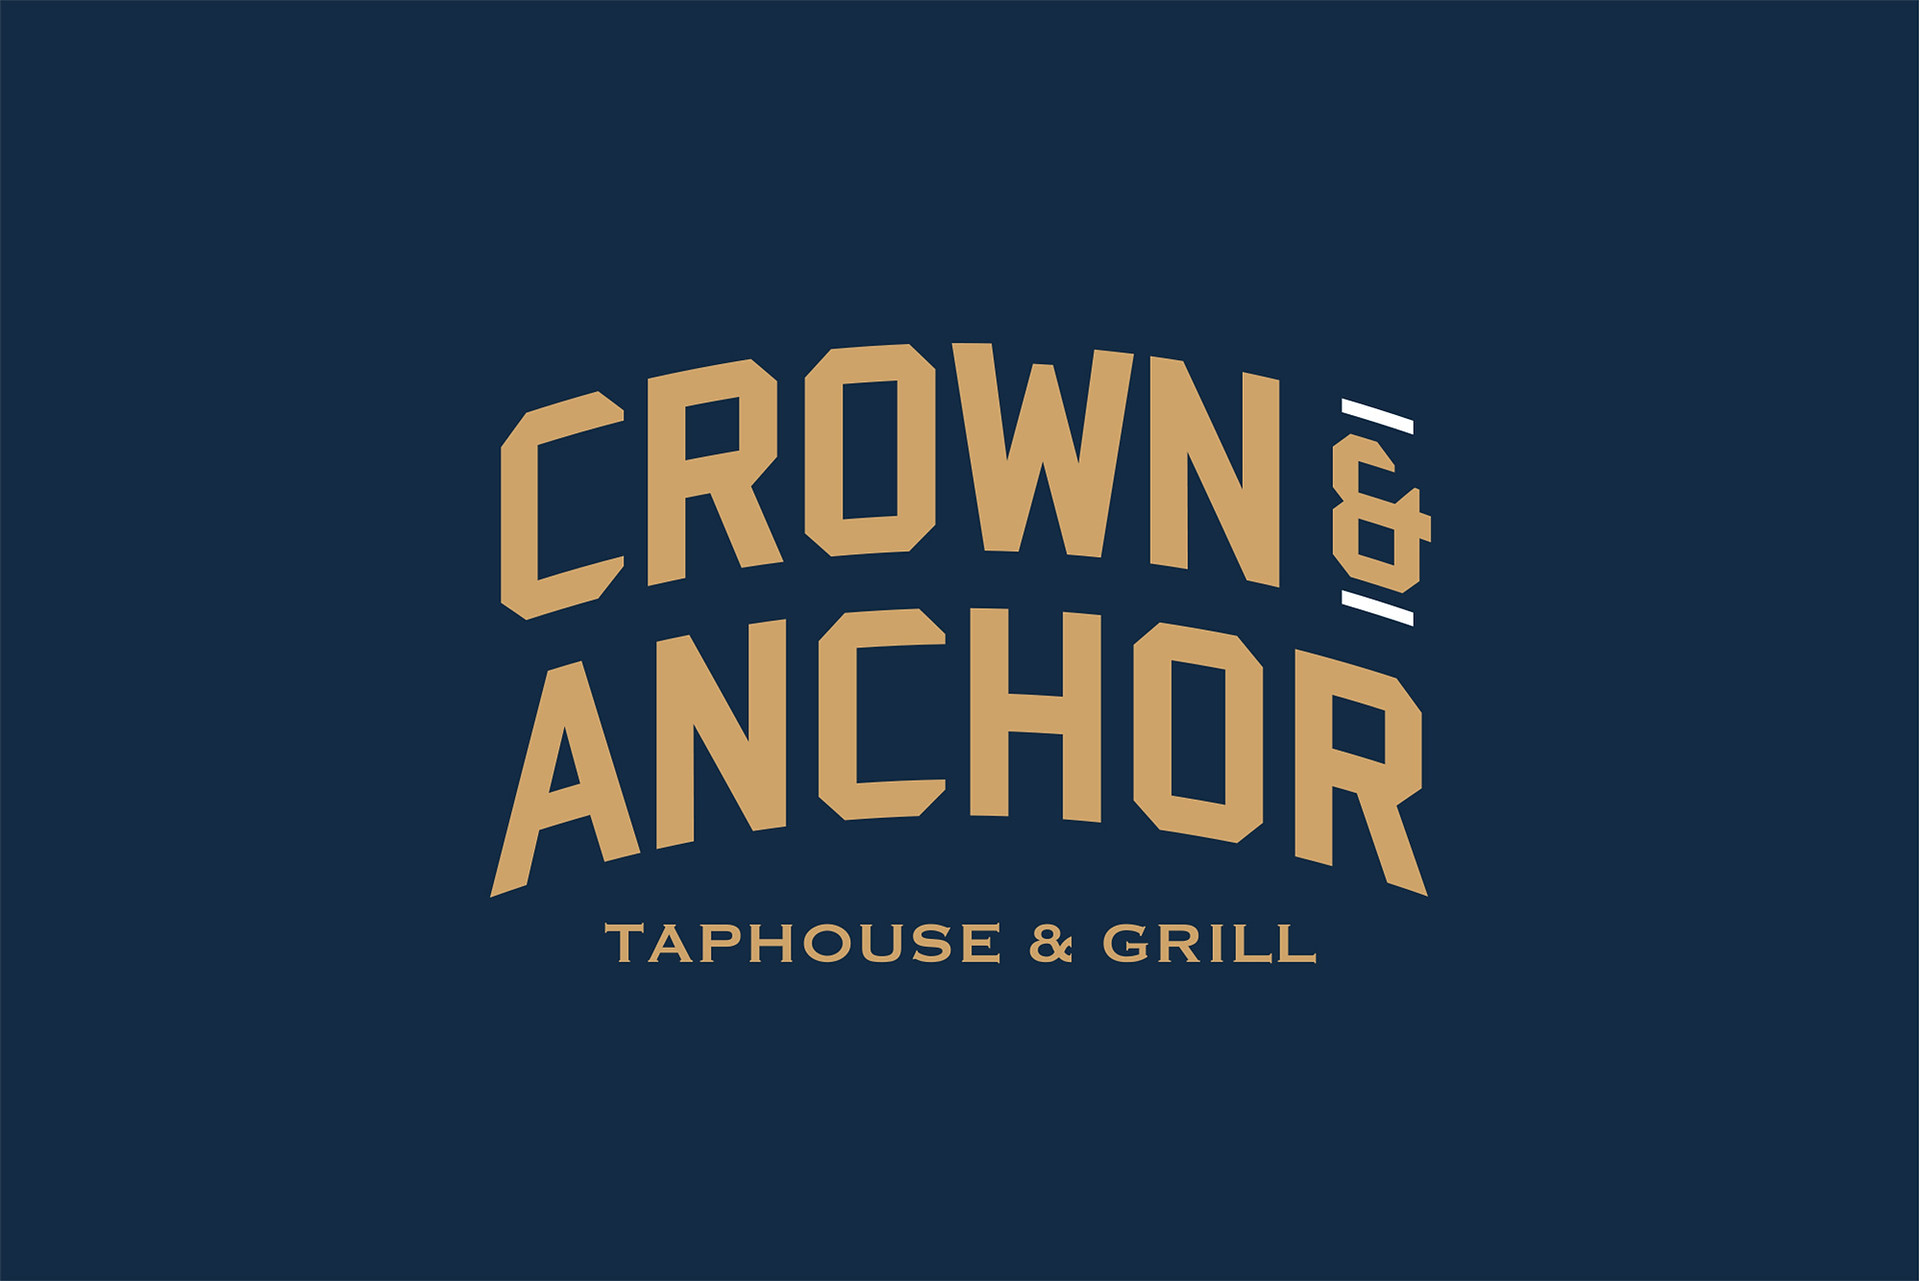 crown-&-Anchor-logo20-copy-2.jpg